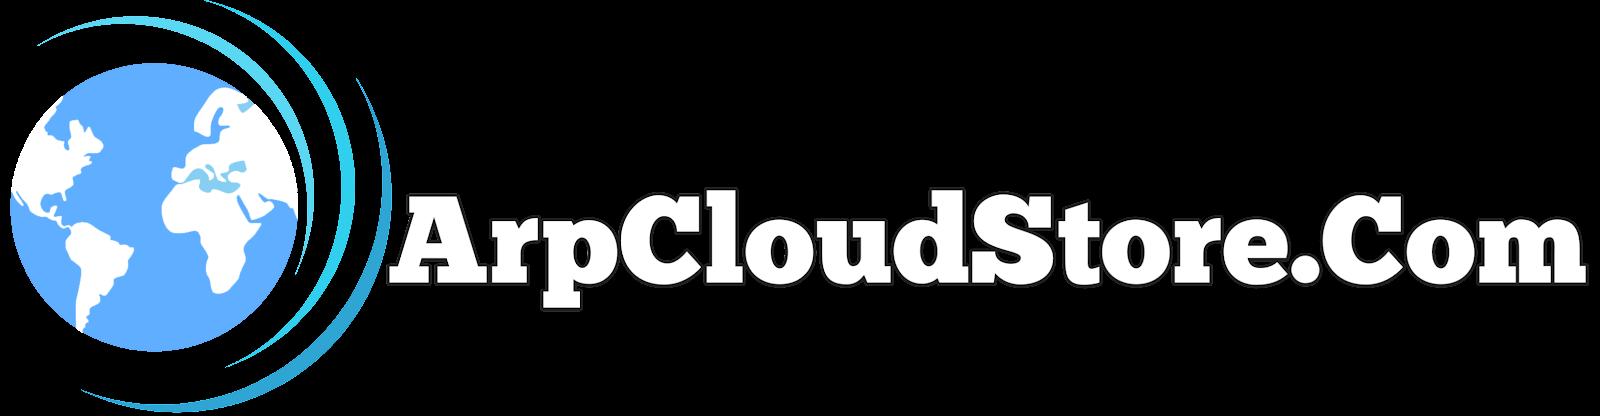 Arp Cloud Store